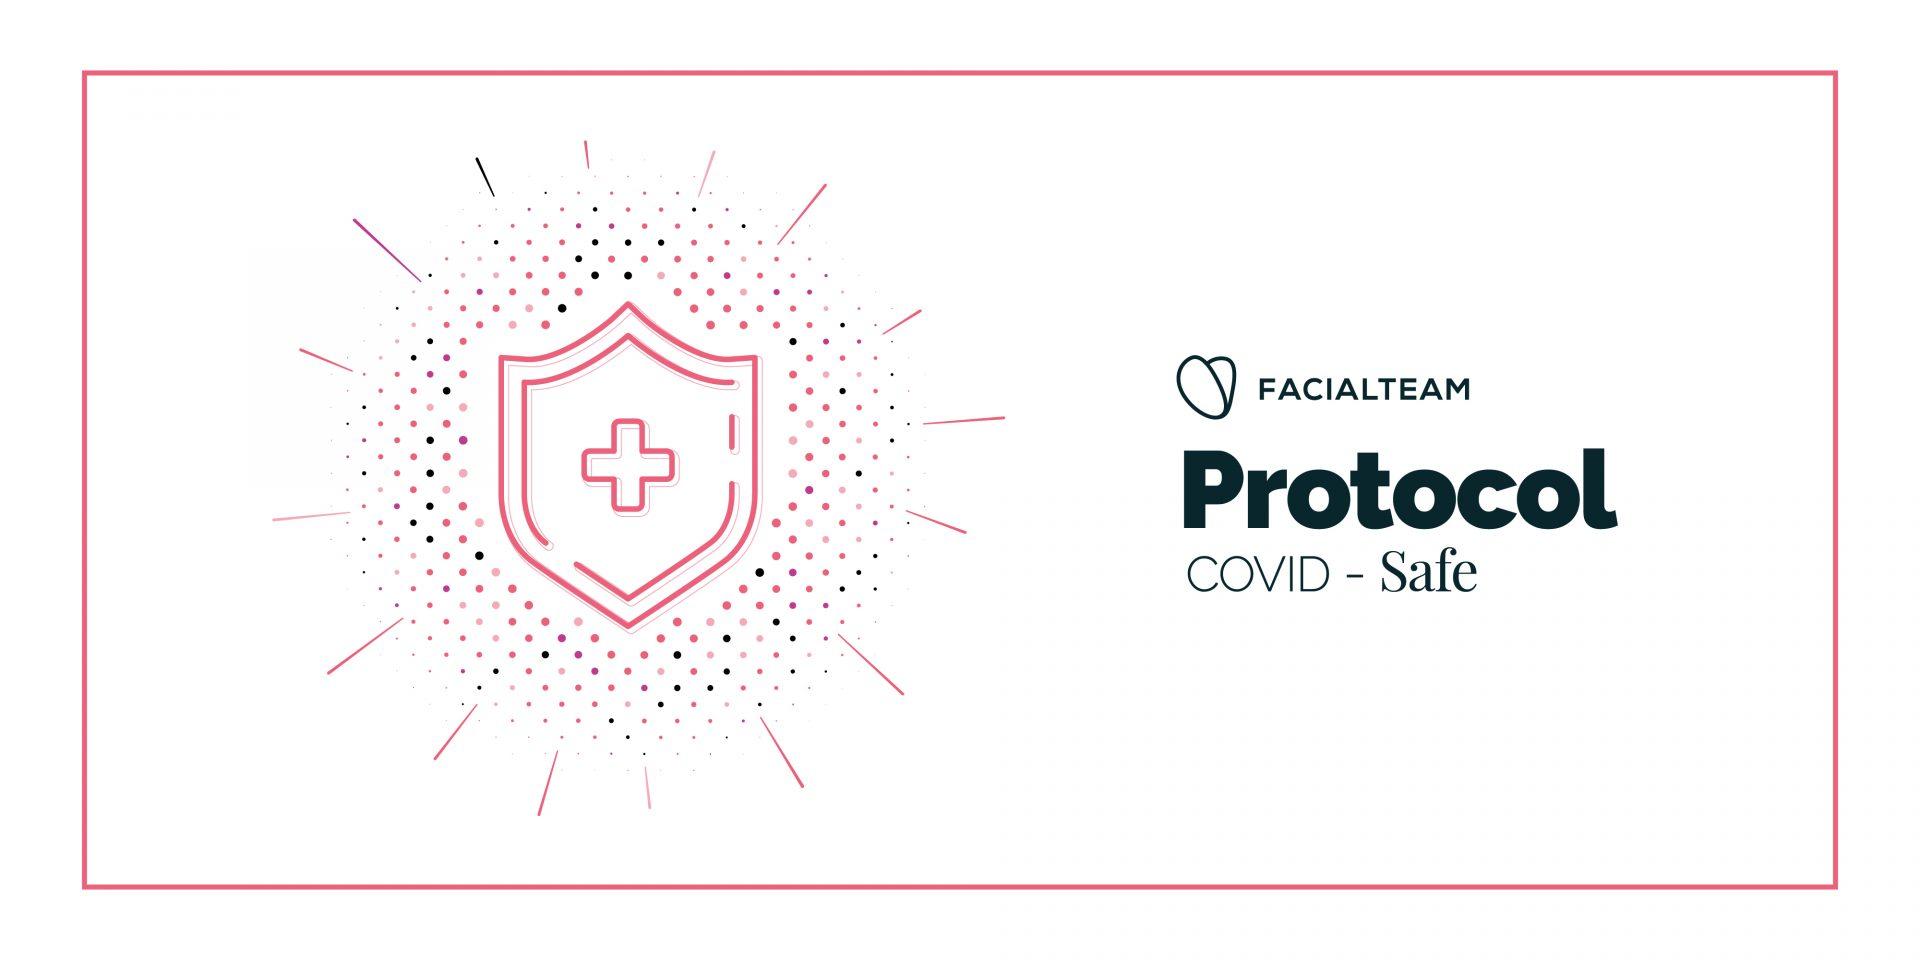 Our COVID-Safe Protocol